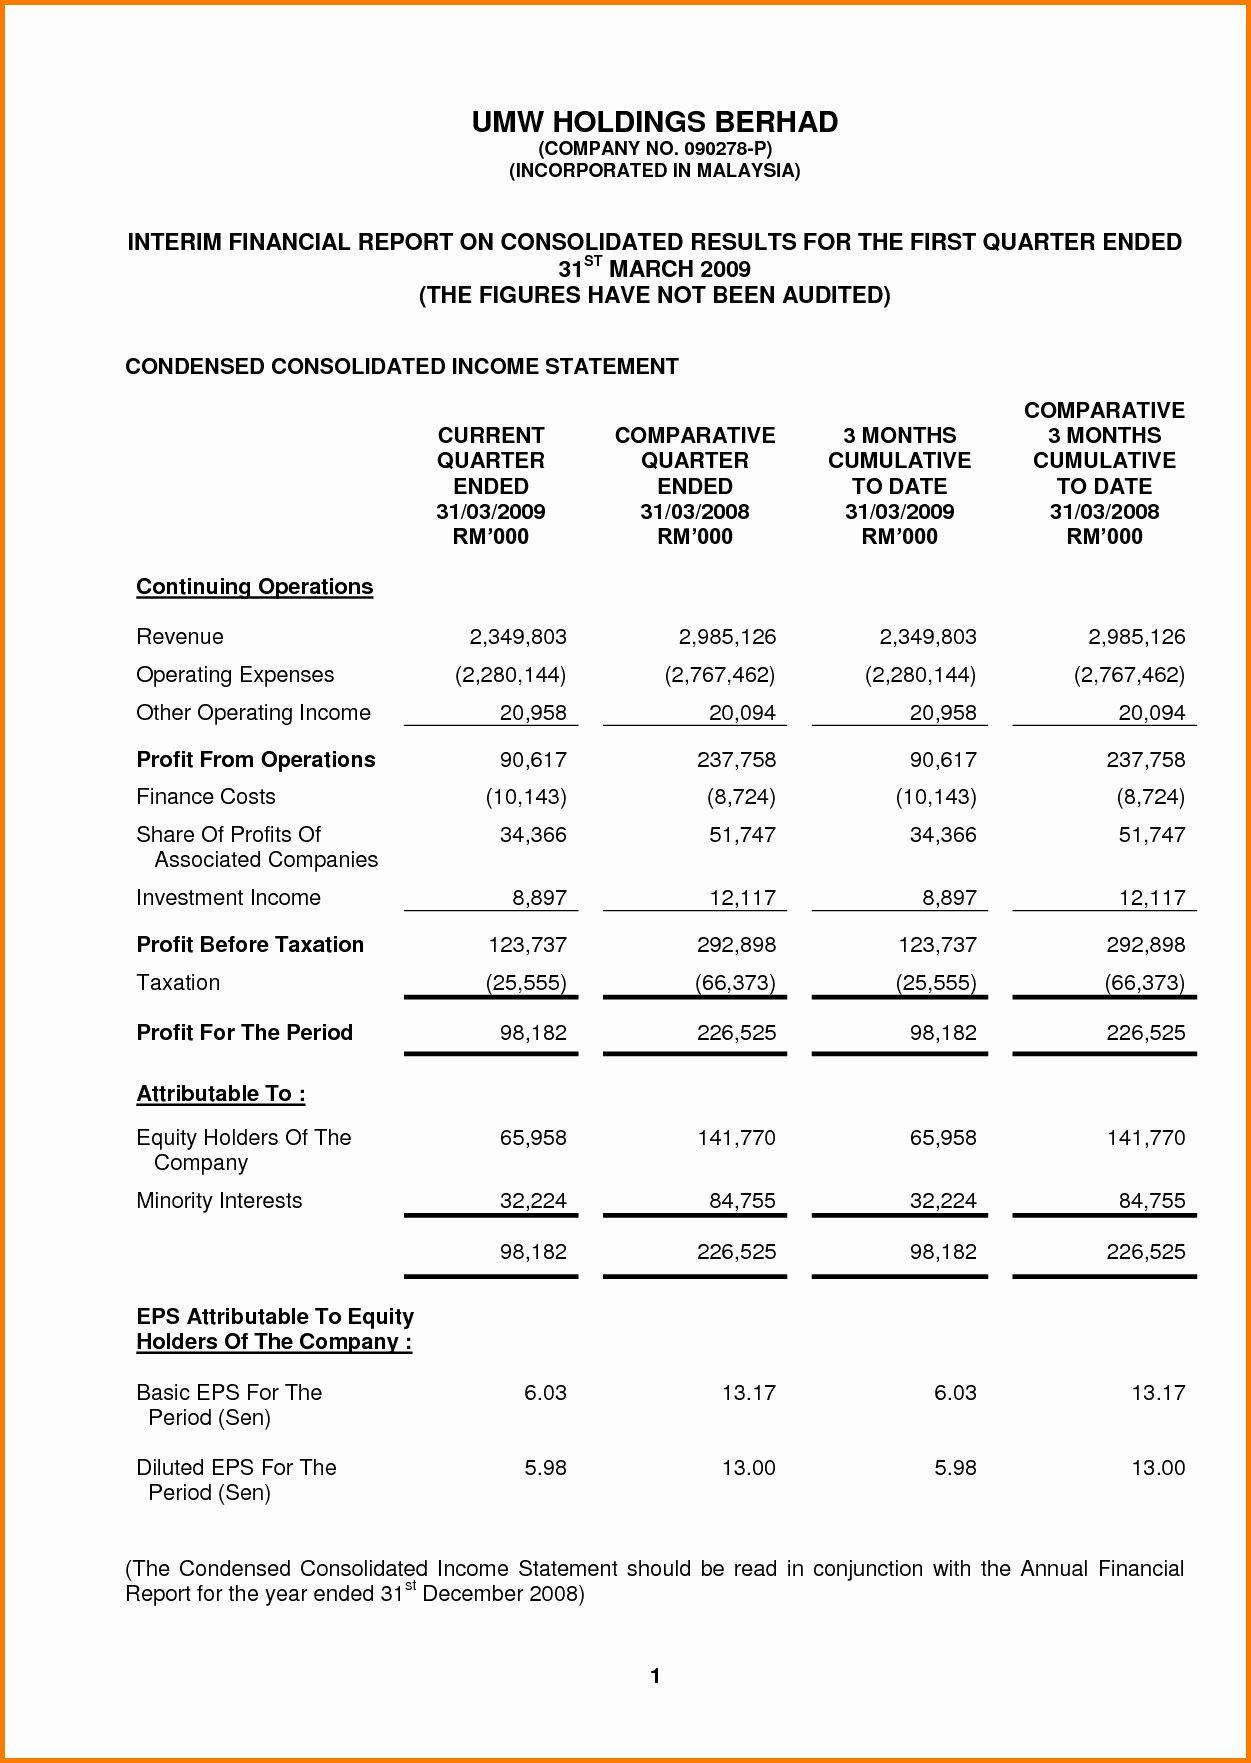 Quickbooks Pro Forma Financial Statements Statement Template Financial Statement Income Statement Pro forma financial statement template